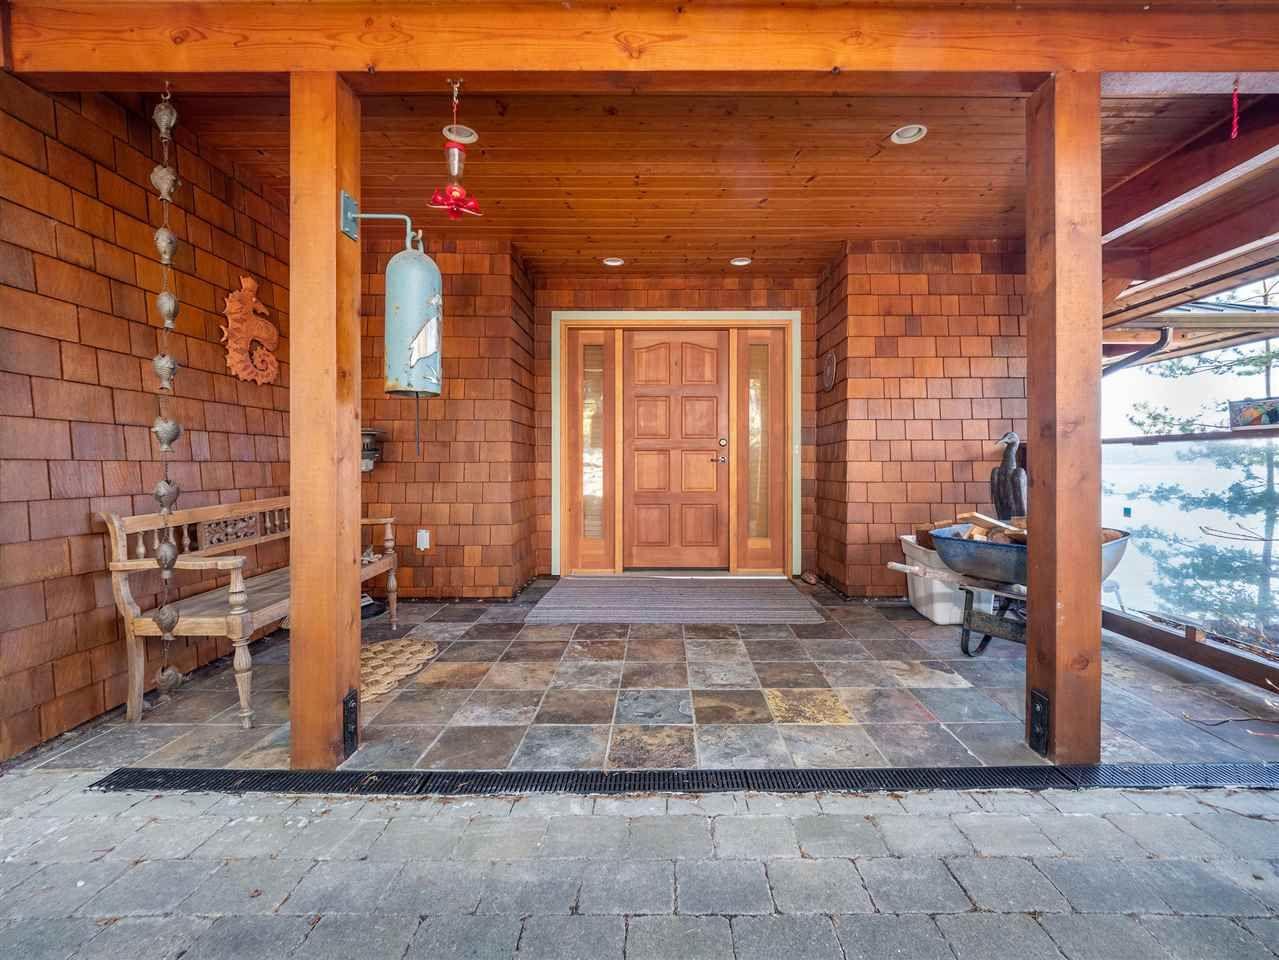 Main Photo: 5285 TAYLOR Crescent in Halfmoon Bay: Halfmn Bay Secret Cv Redroofs House for sale (Sunshine Coast)  : MLS®# R2550371